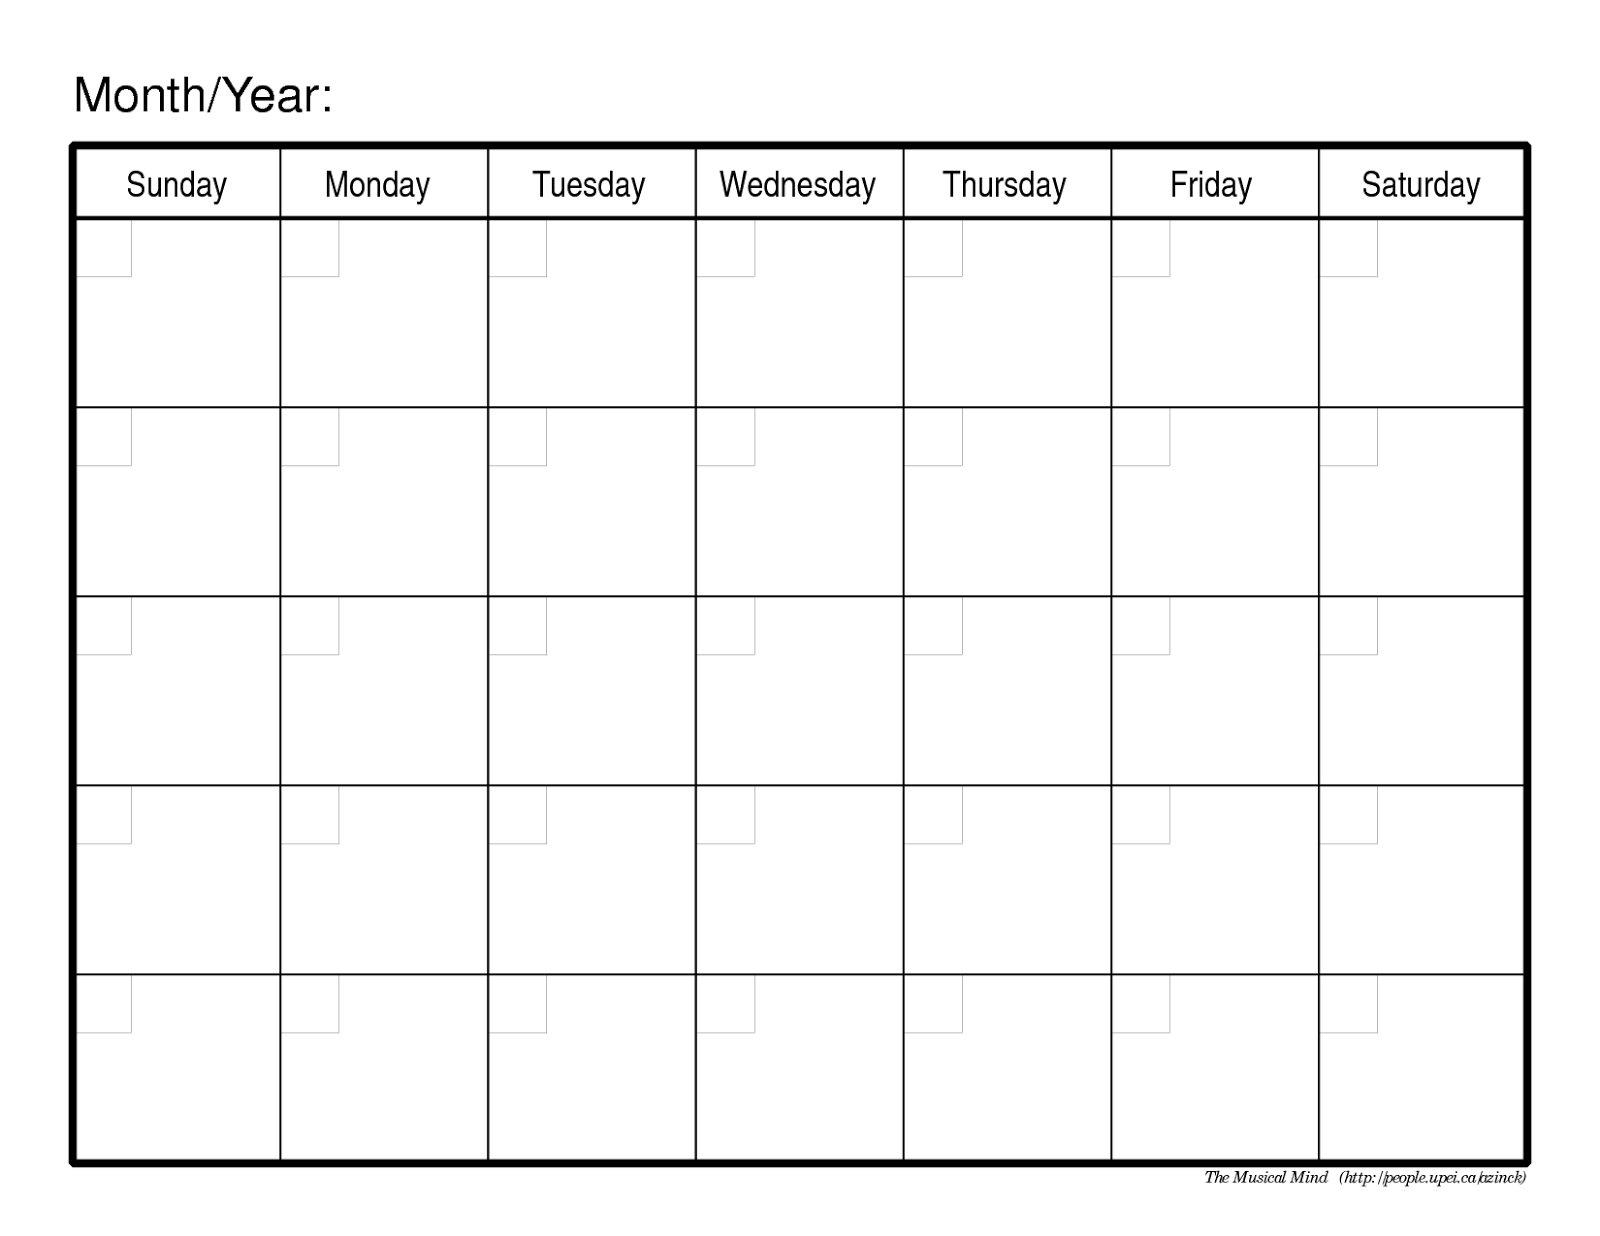 Monthly Calendar No Dates Free Blank Calendar For One Week Printable